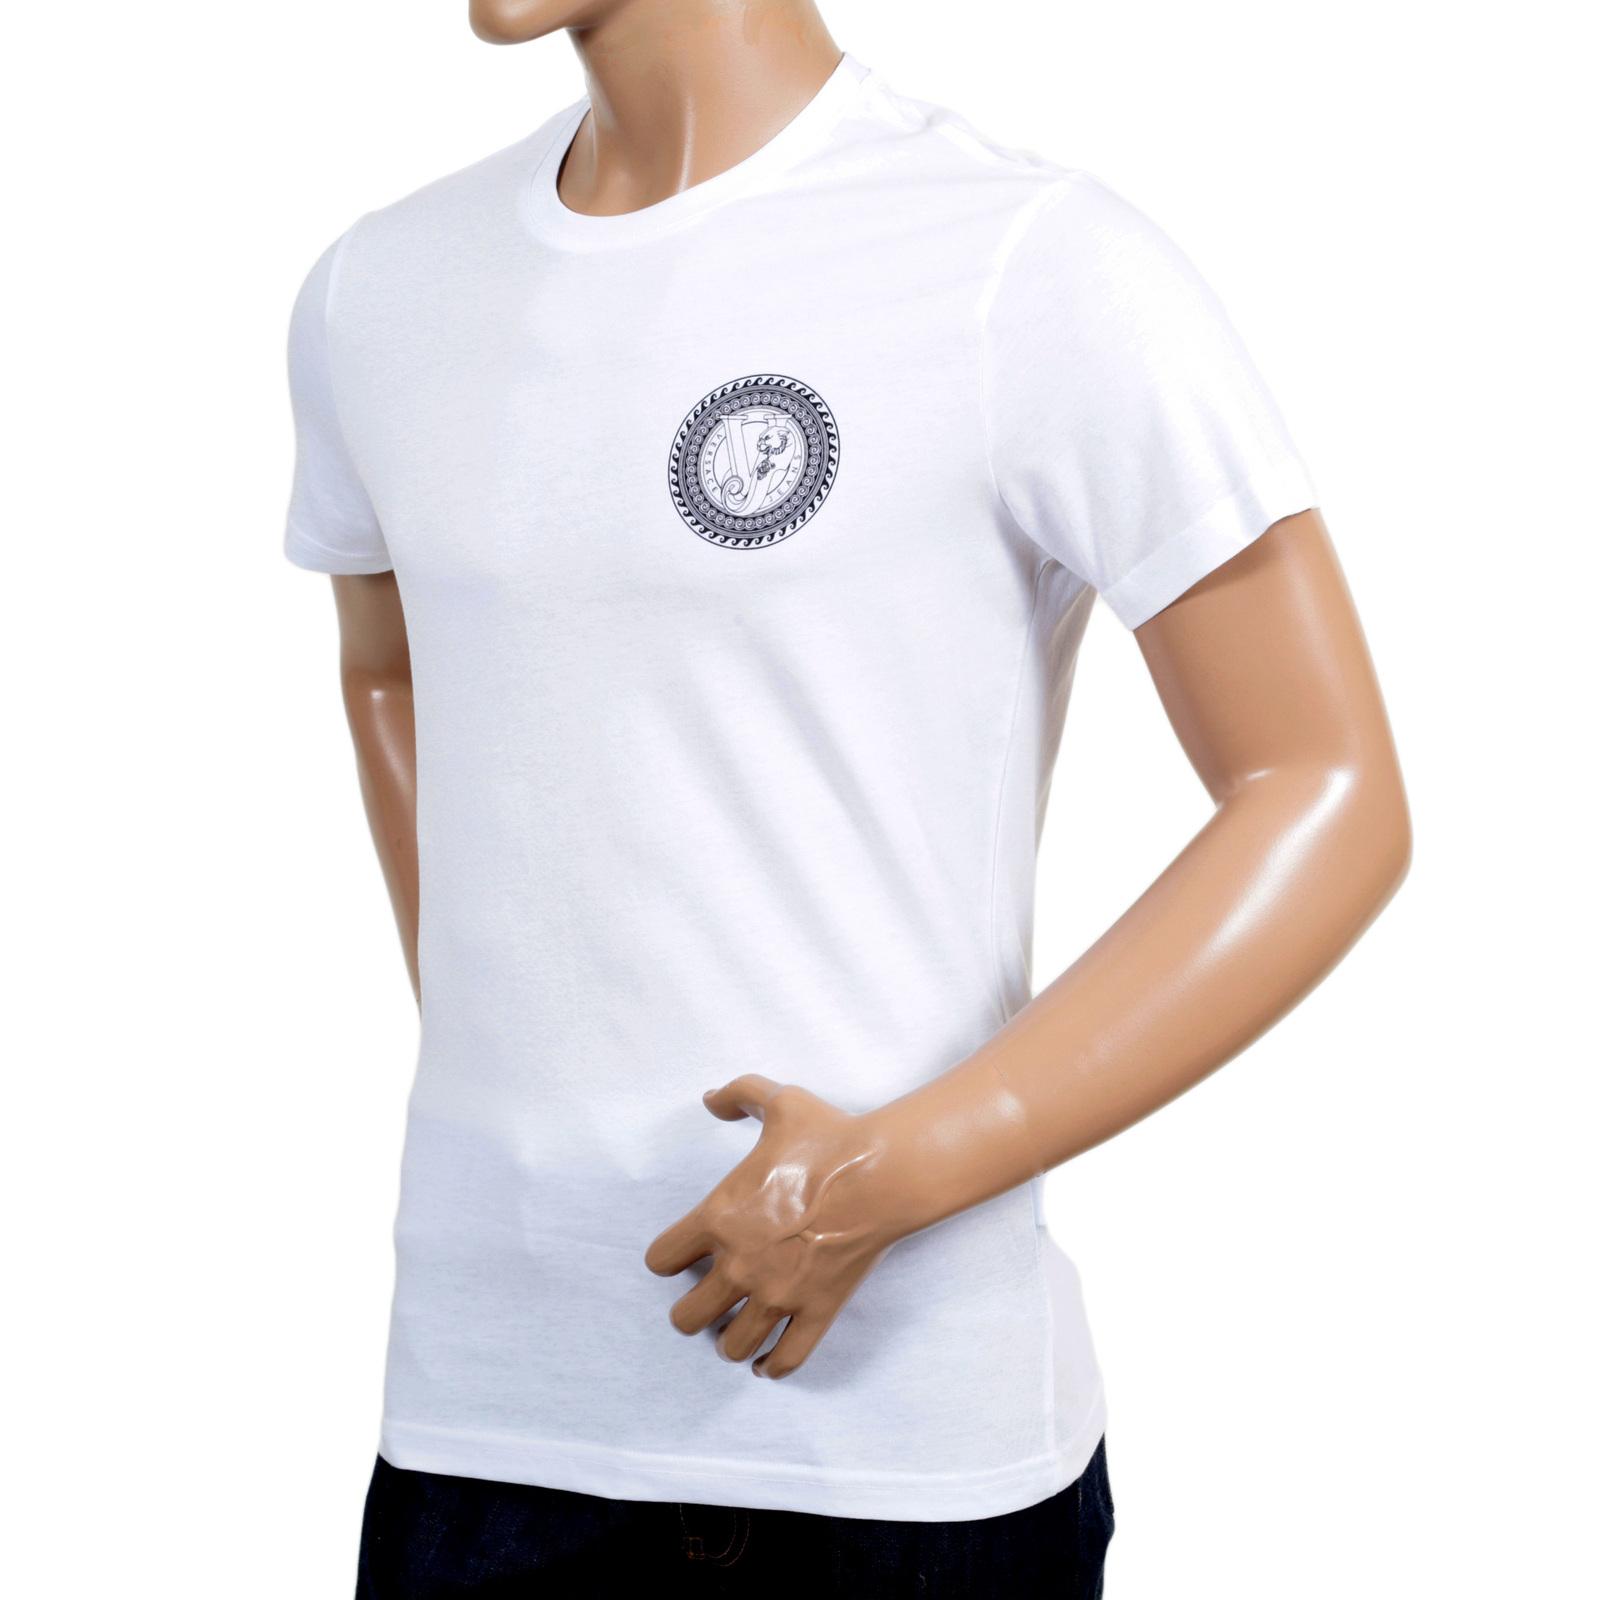 buy this fashion cotton versace white crew neck t shirt. Black Bedroom Furniture Sets. Home Design Ideas